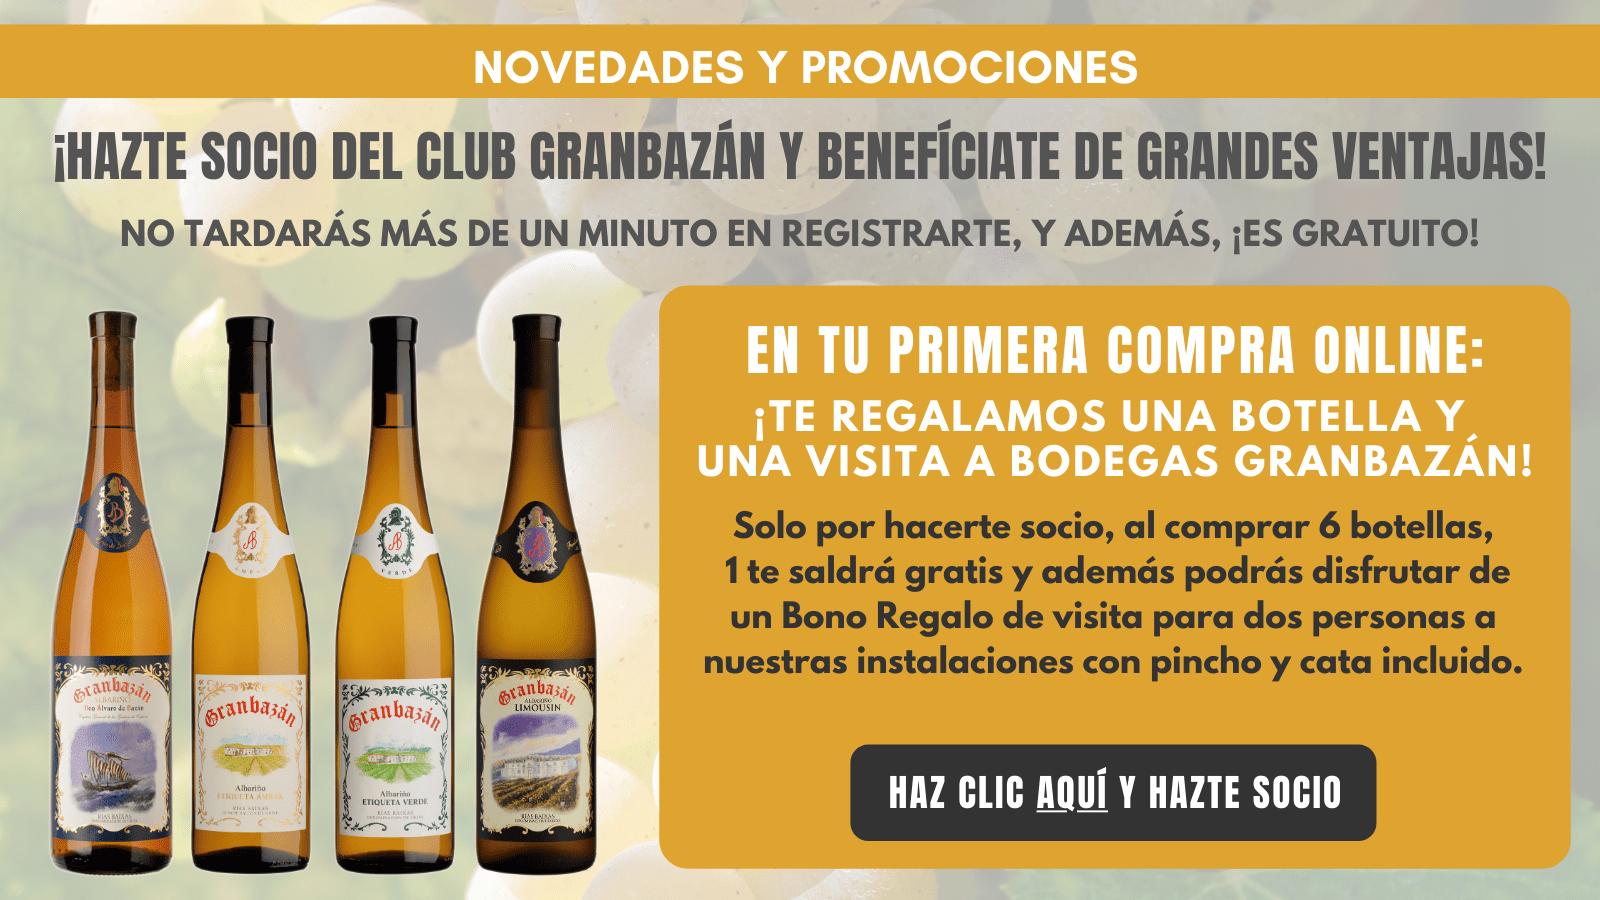 Club Granbazan Ventajas